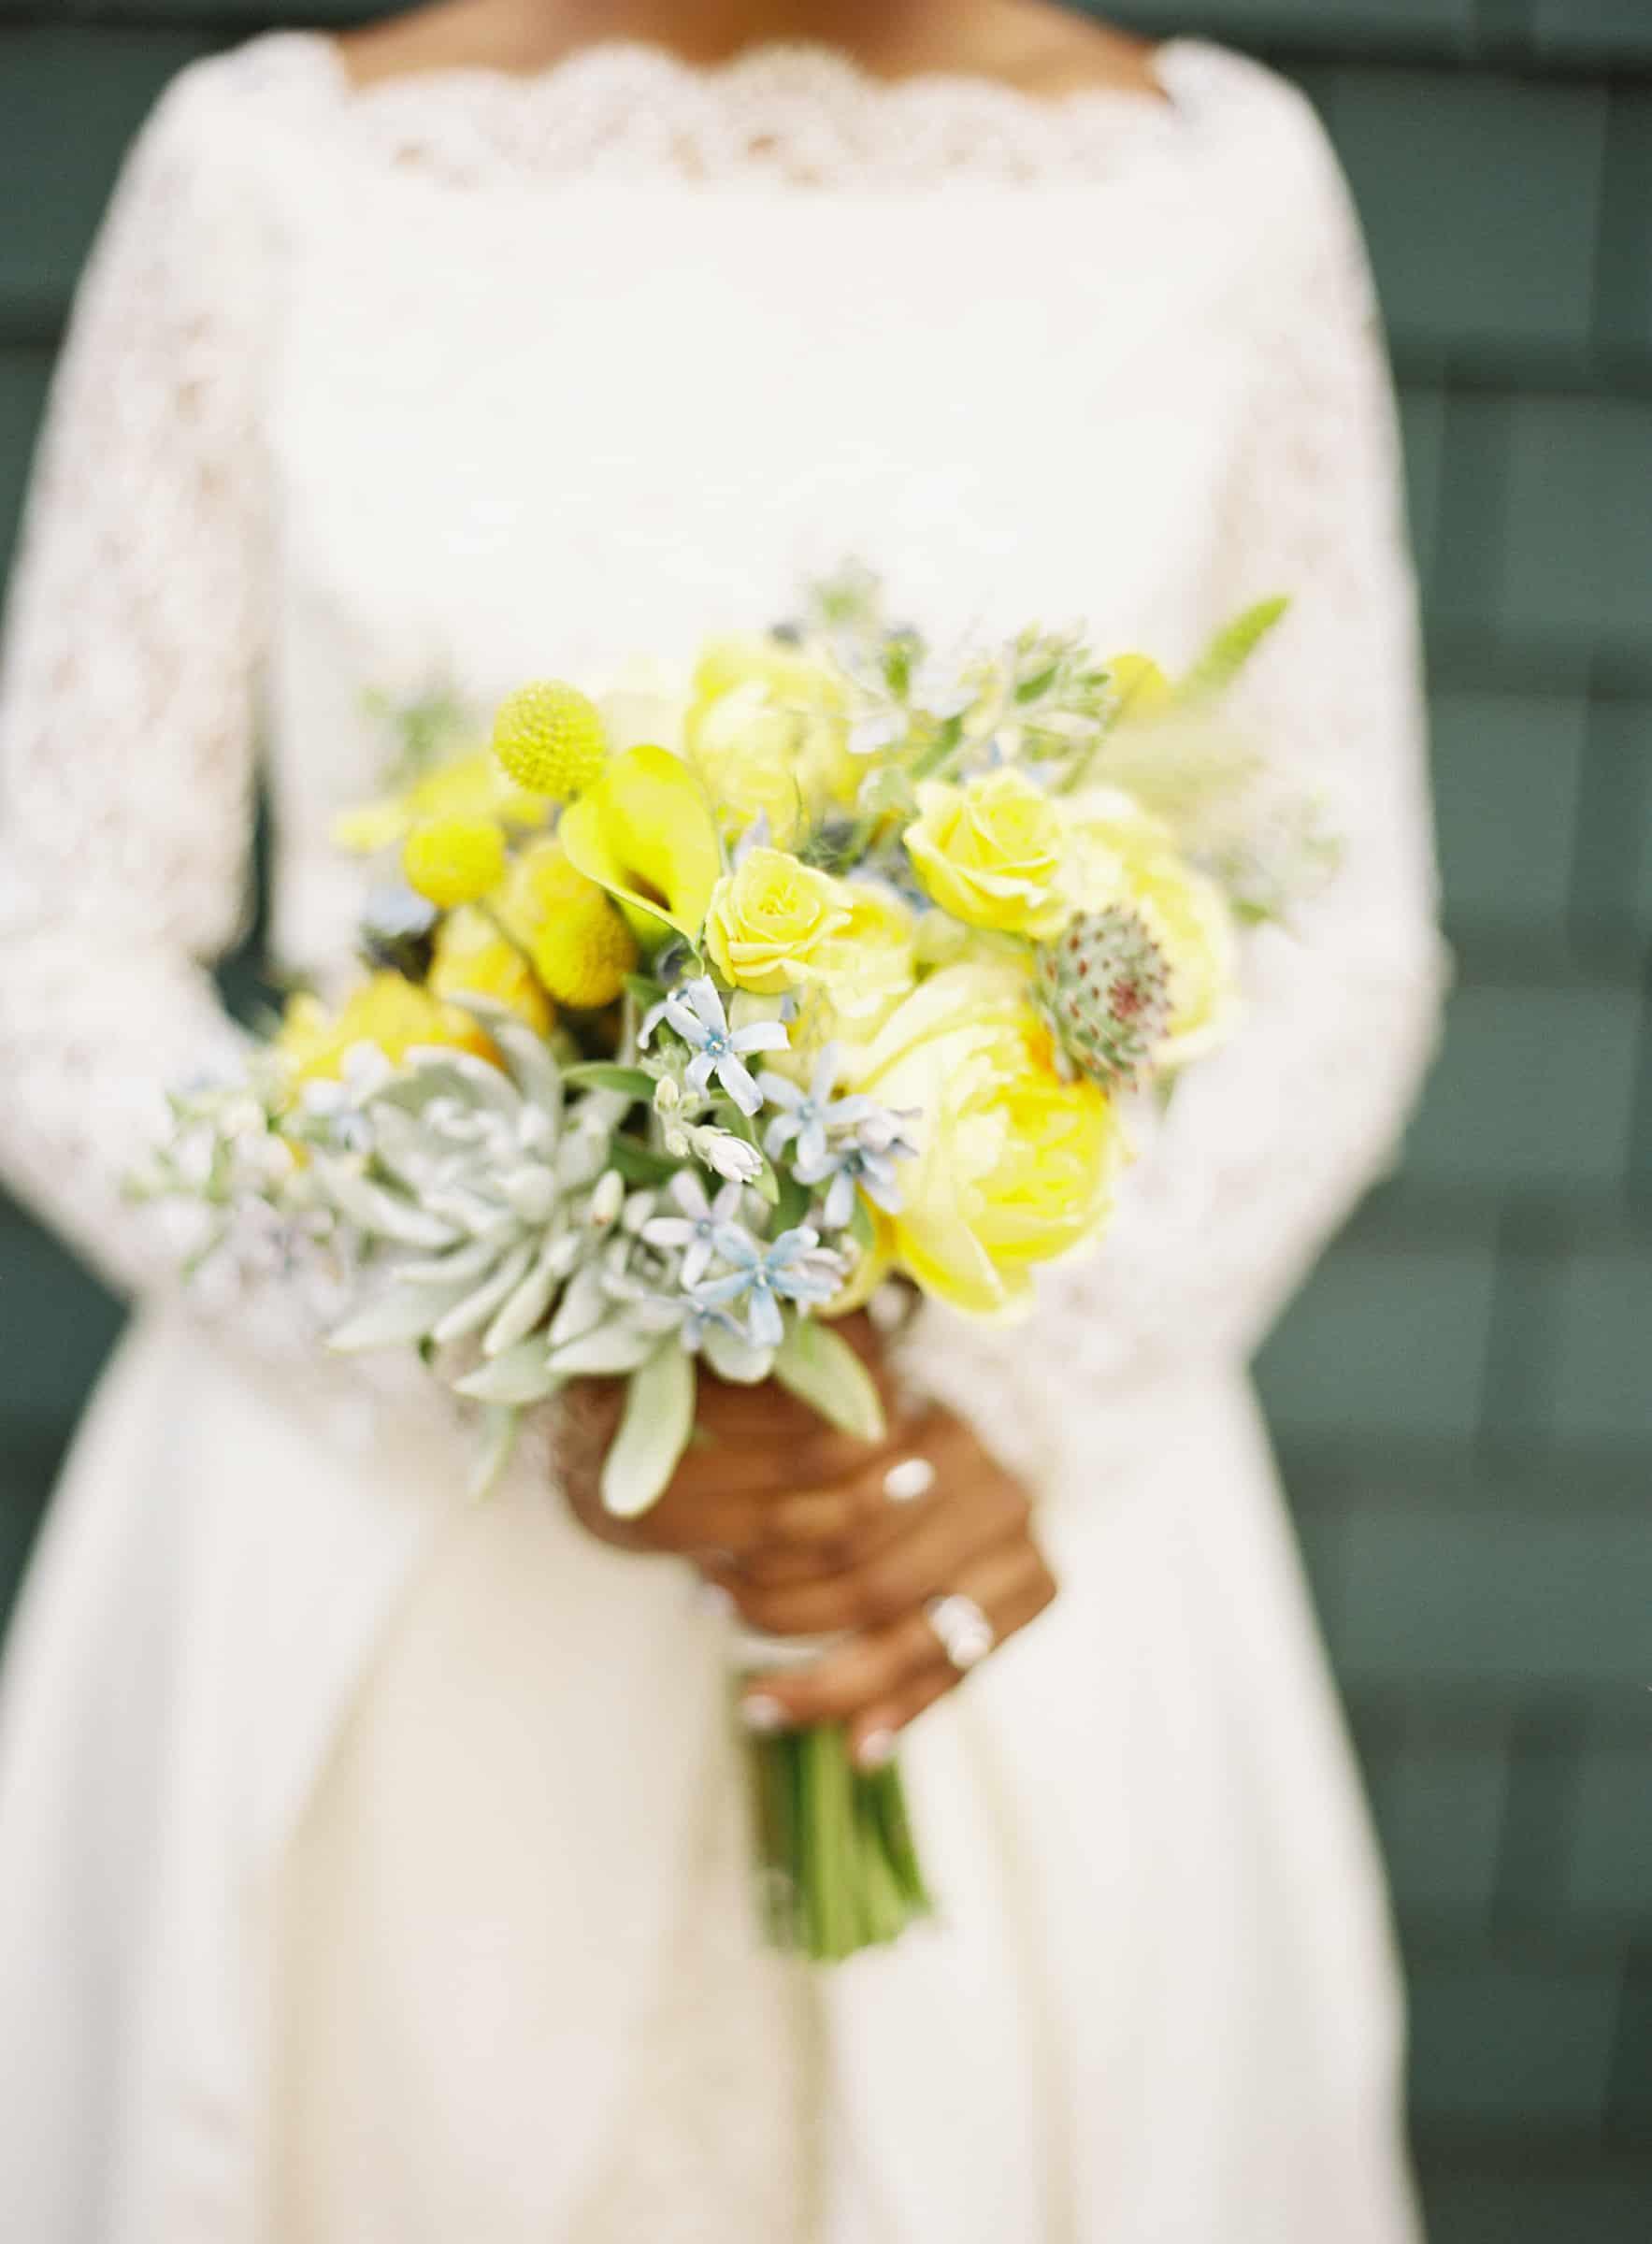 Closeup of bride holdign yellow bouquet